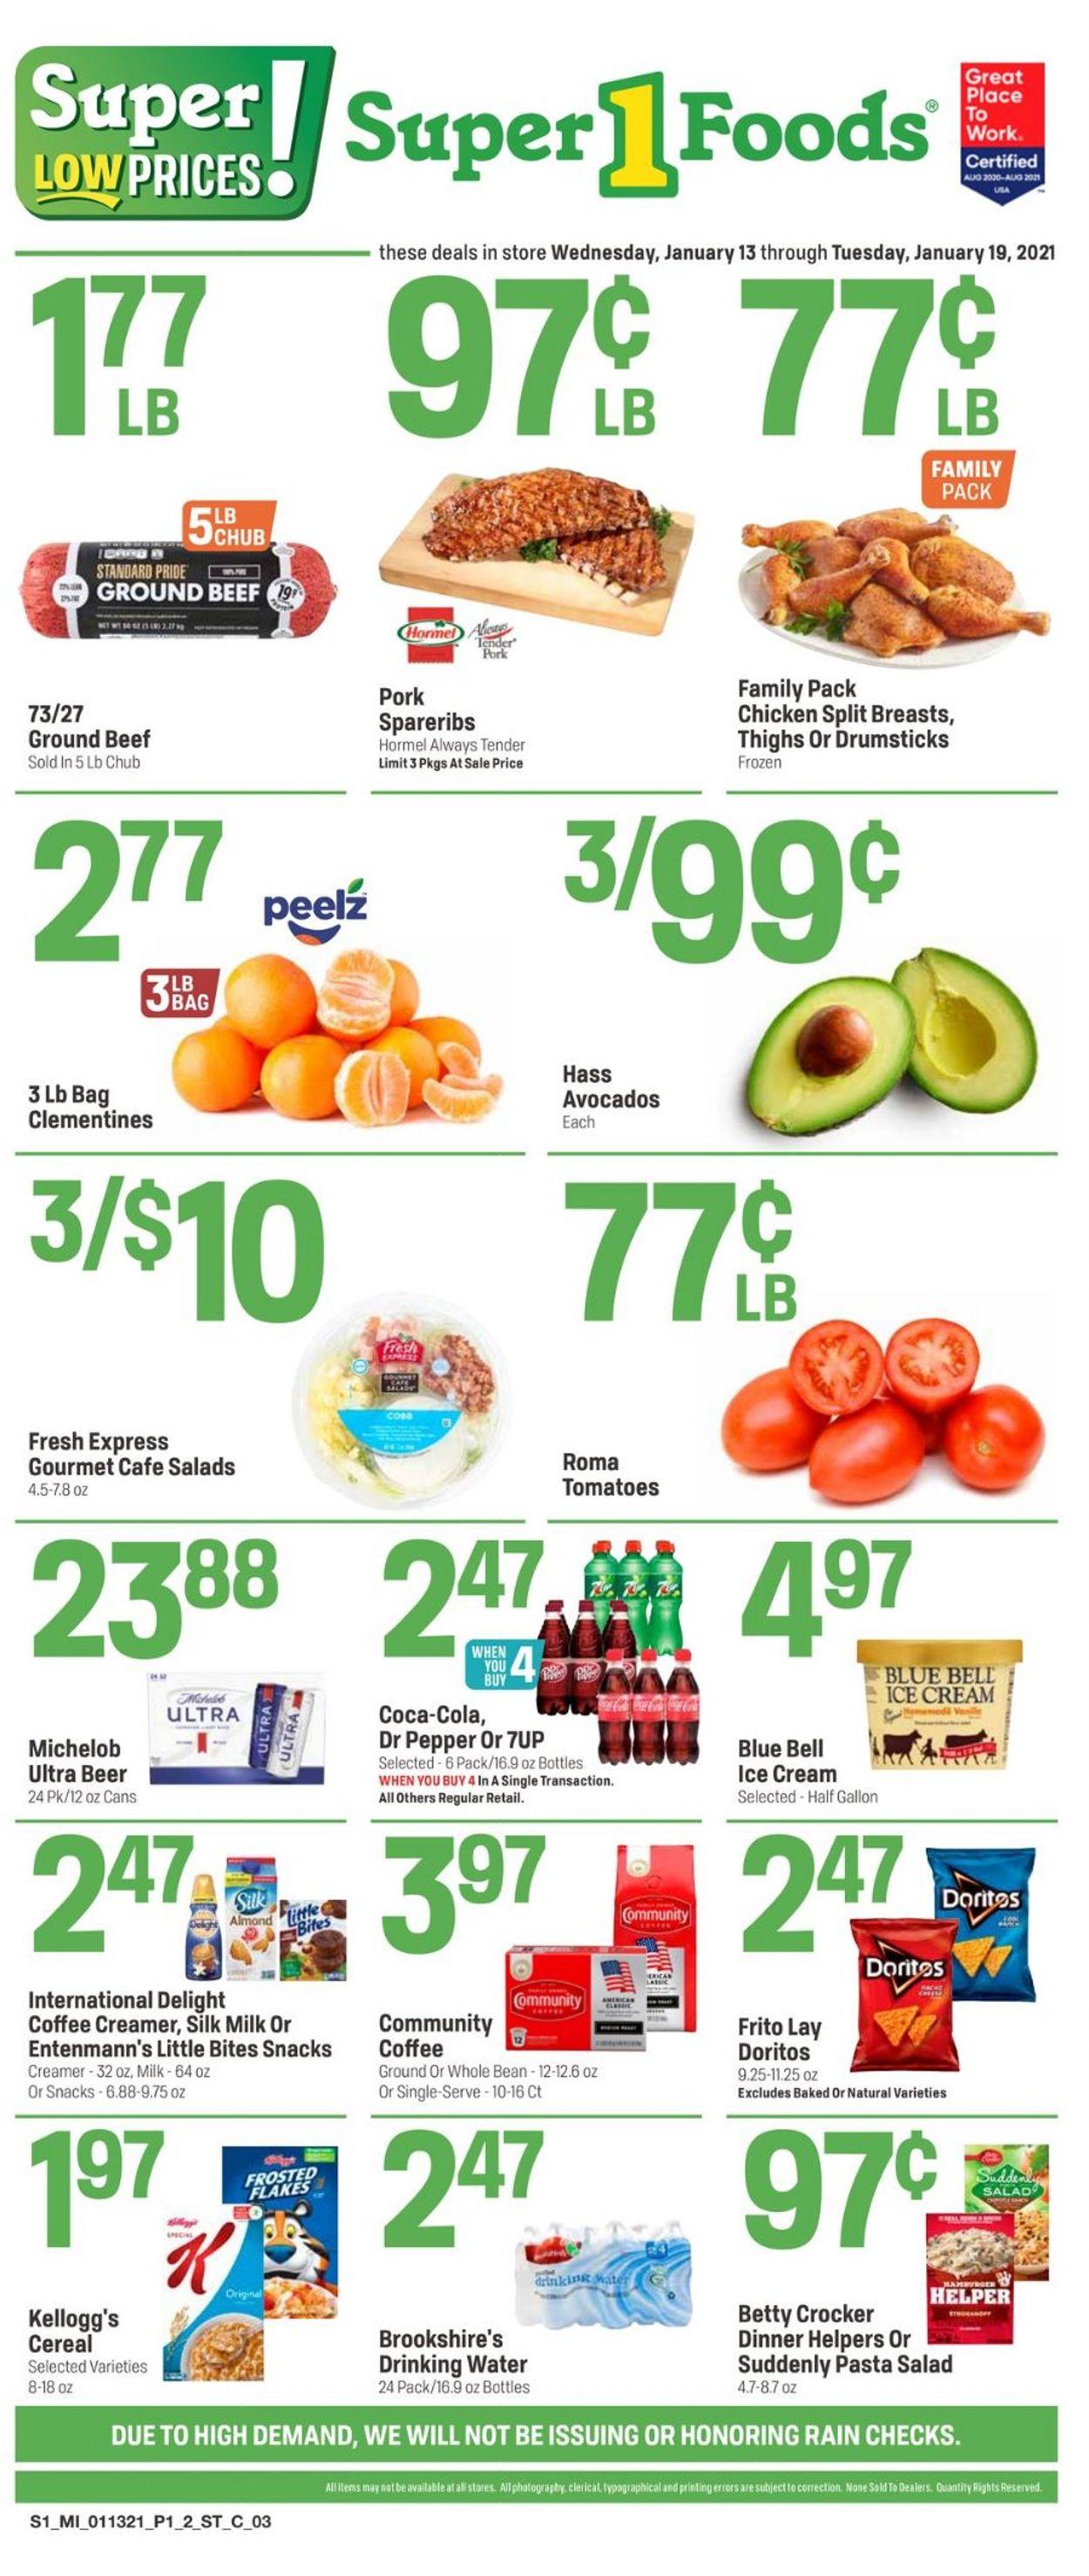 Super 1 Foods Weekly Ad Circular - valid 01/13-01/19/2021